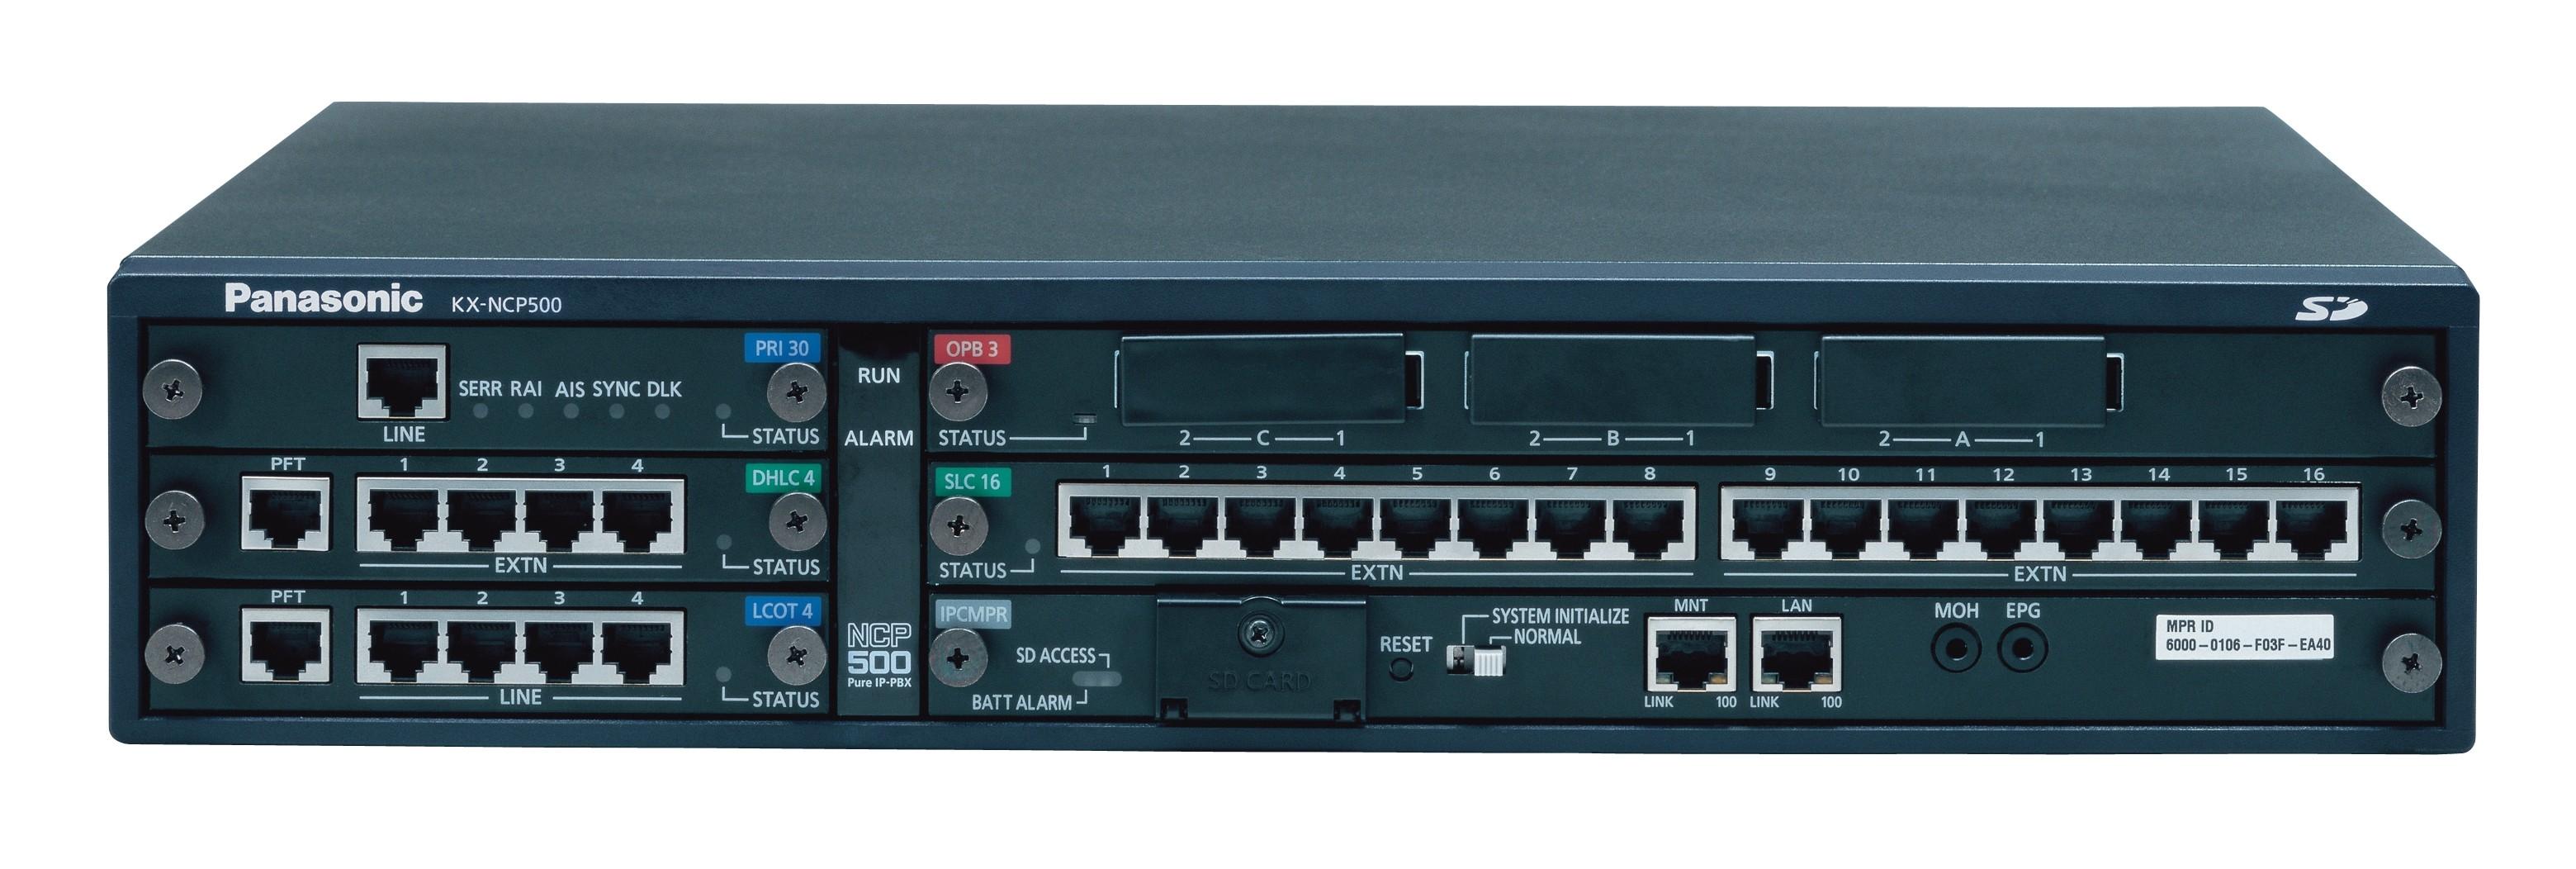 panasonic kx ncp500x pbx telephone system from 650 00 pmc telecom rh pmctelecom co uk Panasonic Cordless Phones Panasonic.comsupportbycncompass